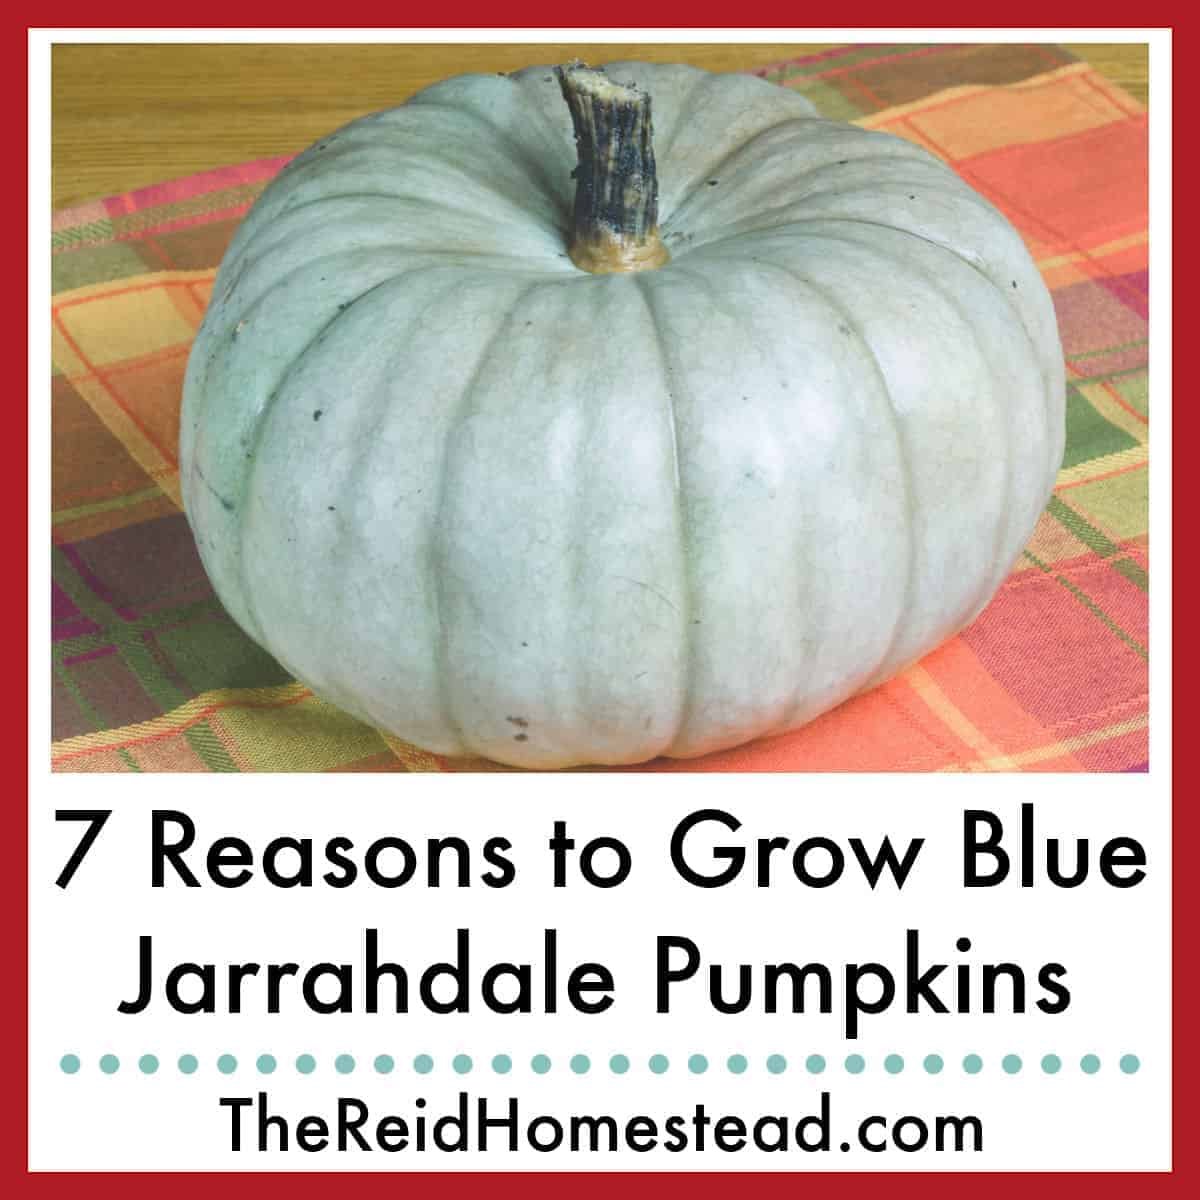 7 Reasons Why You Should Grow Blue Jarrahdale Pumpkins